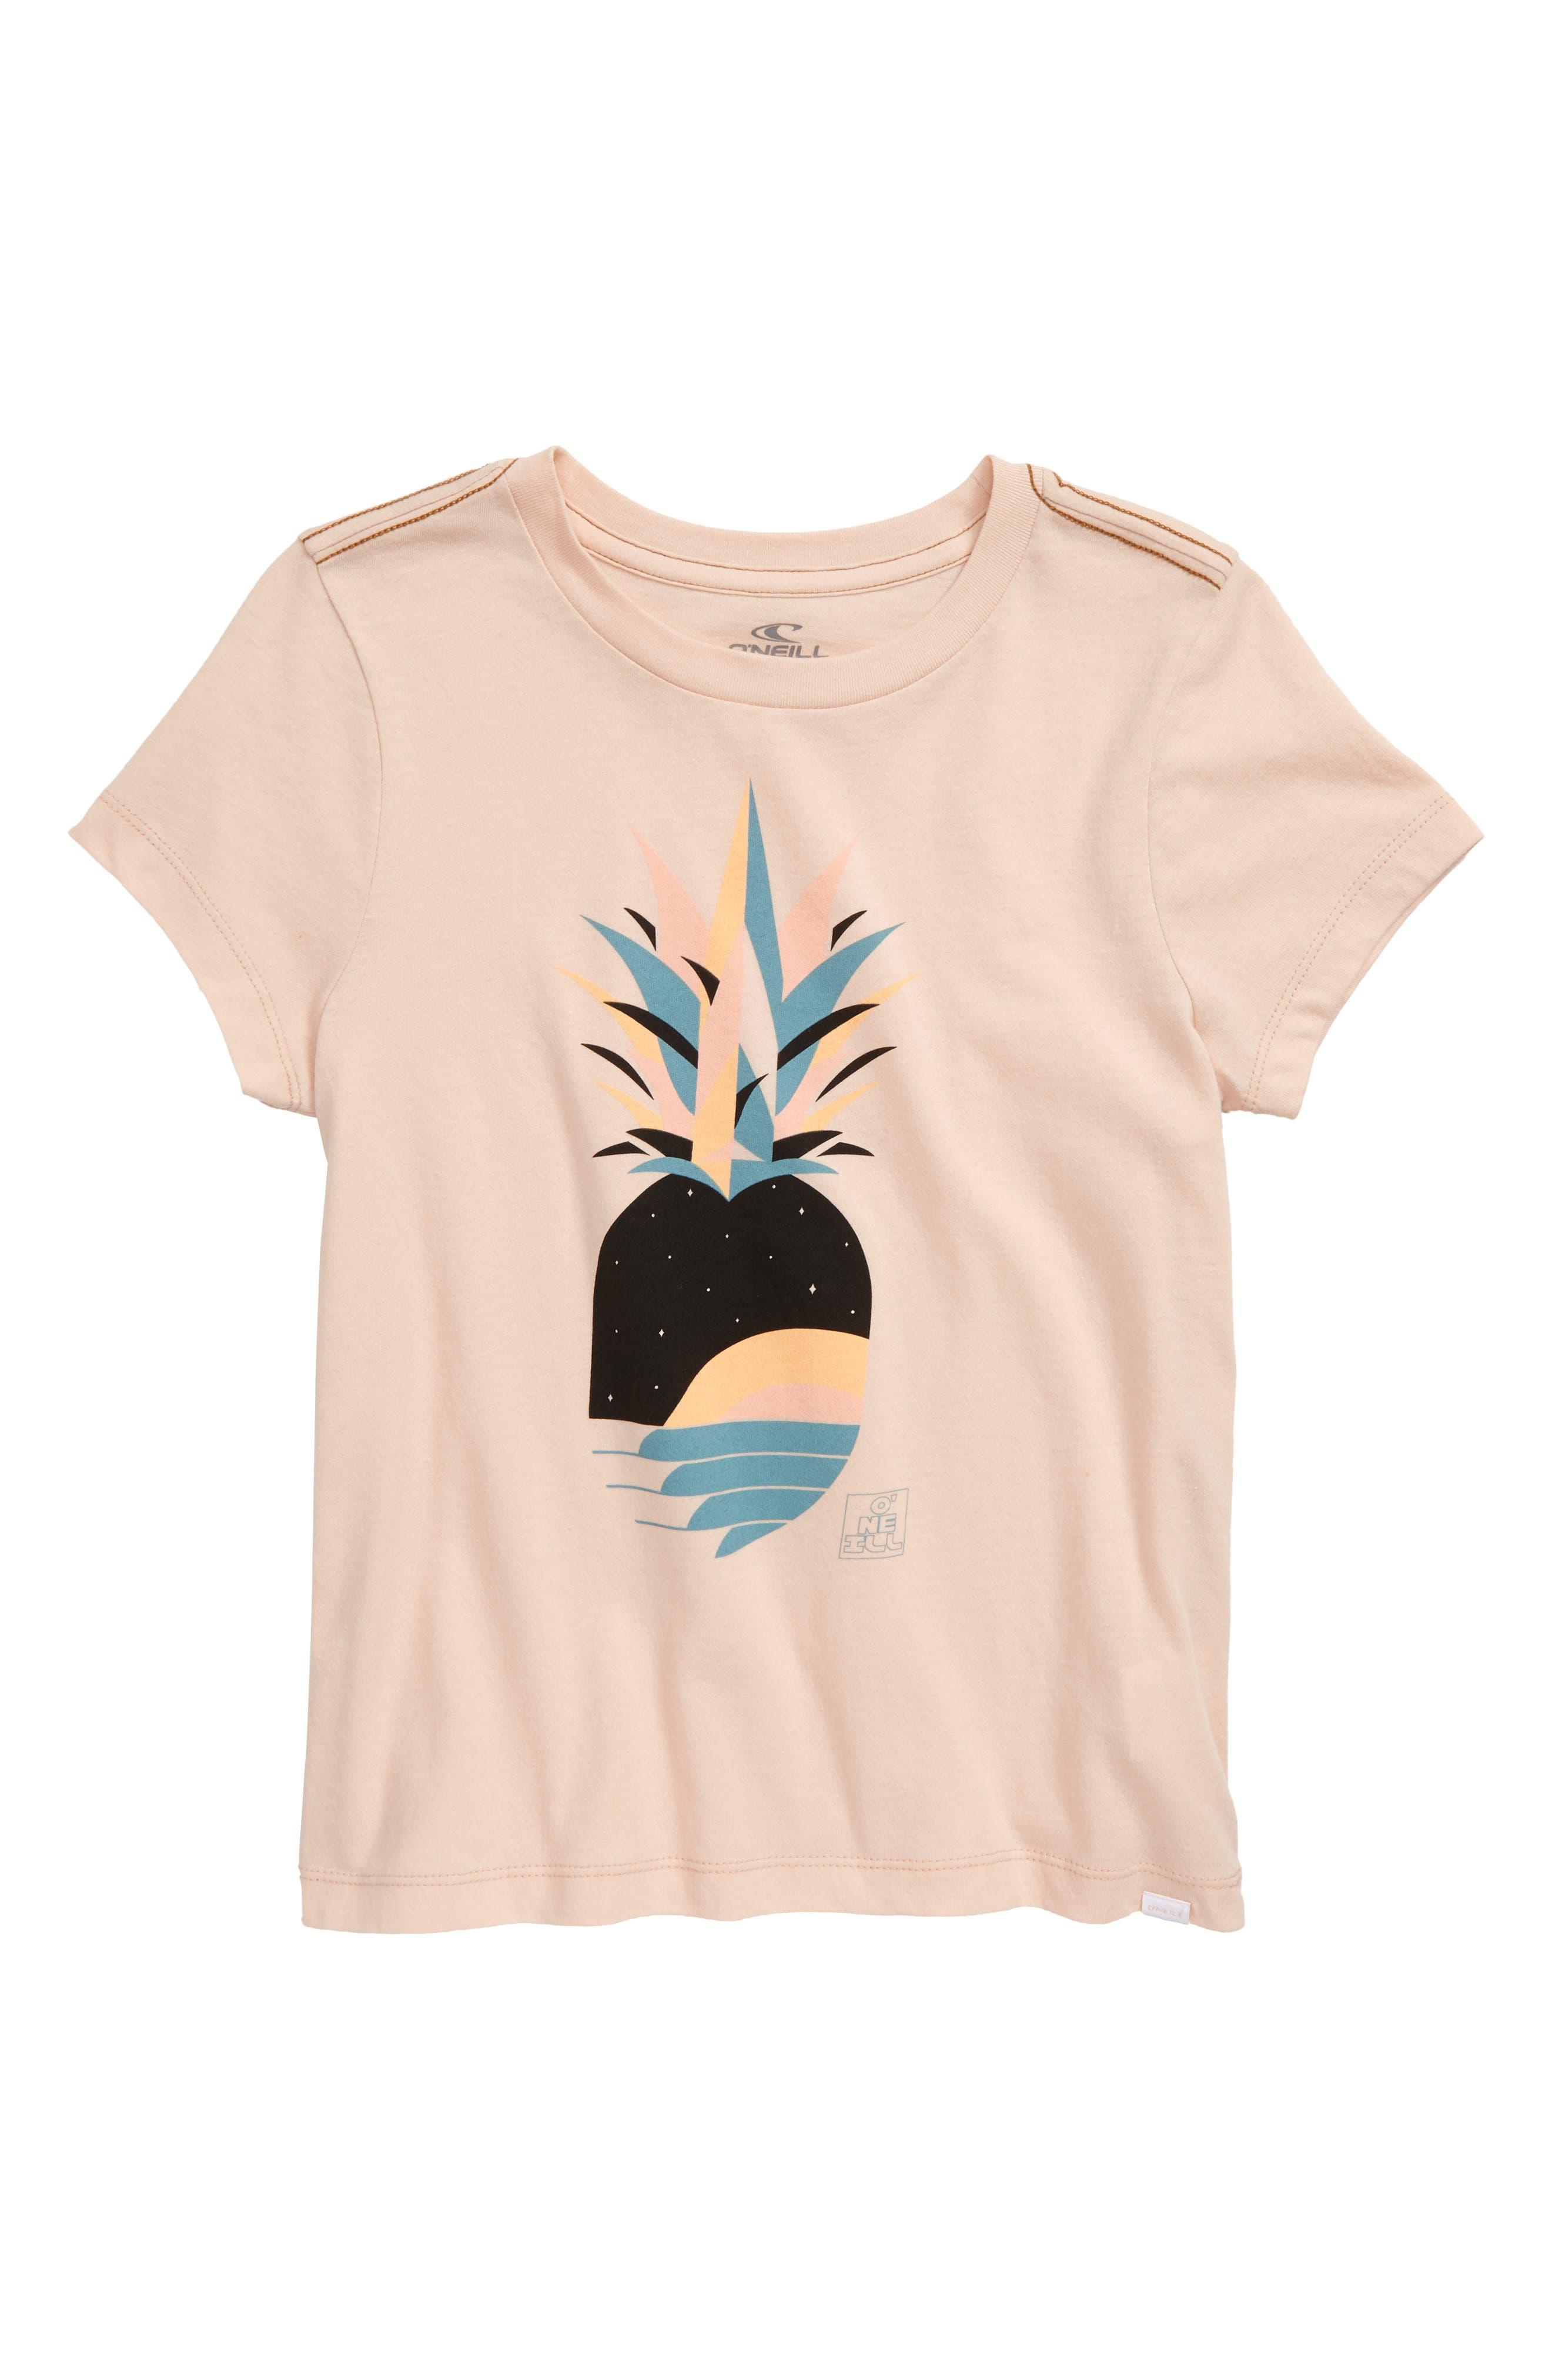 Girls ONeill Galaxy Pineapple Print Tee